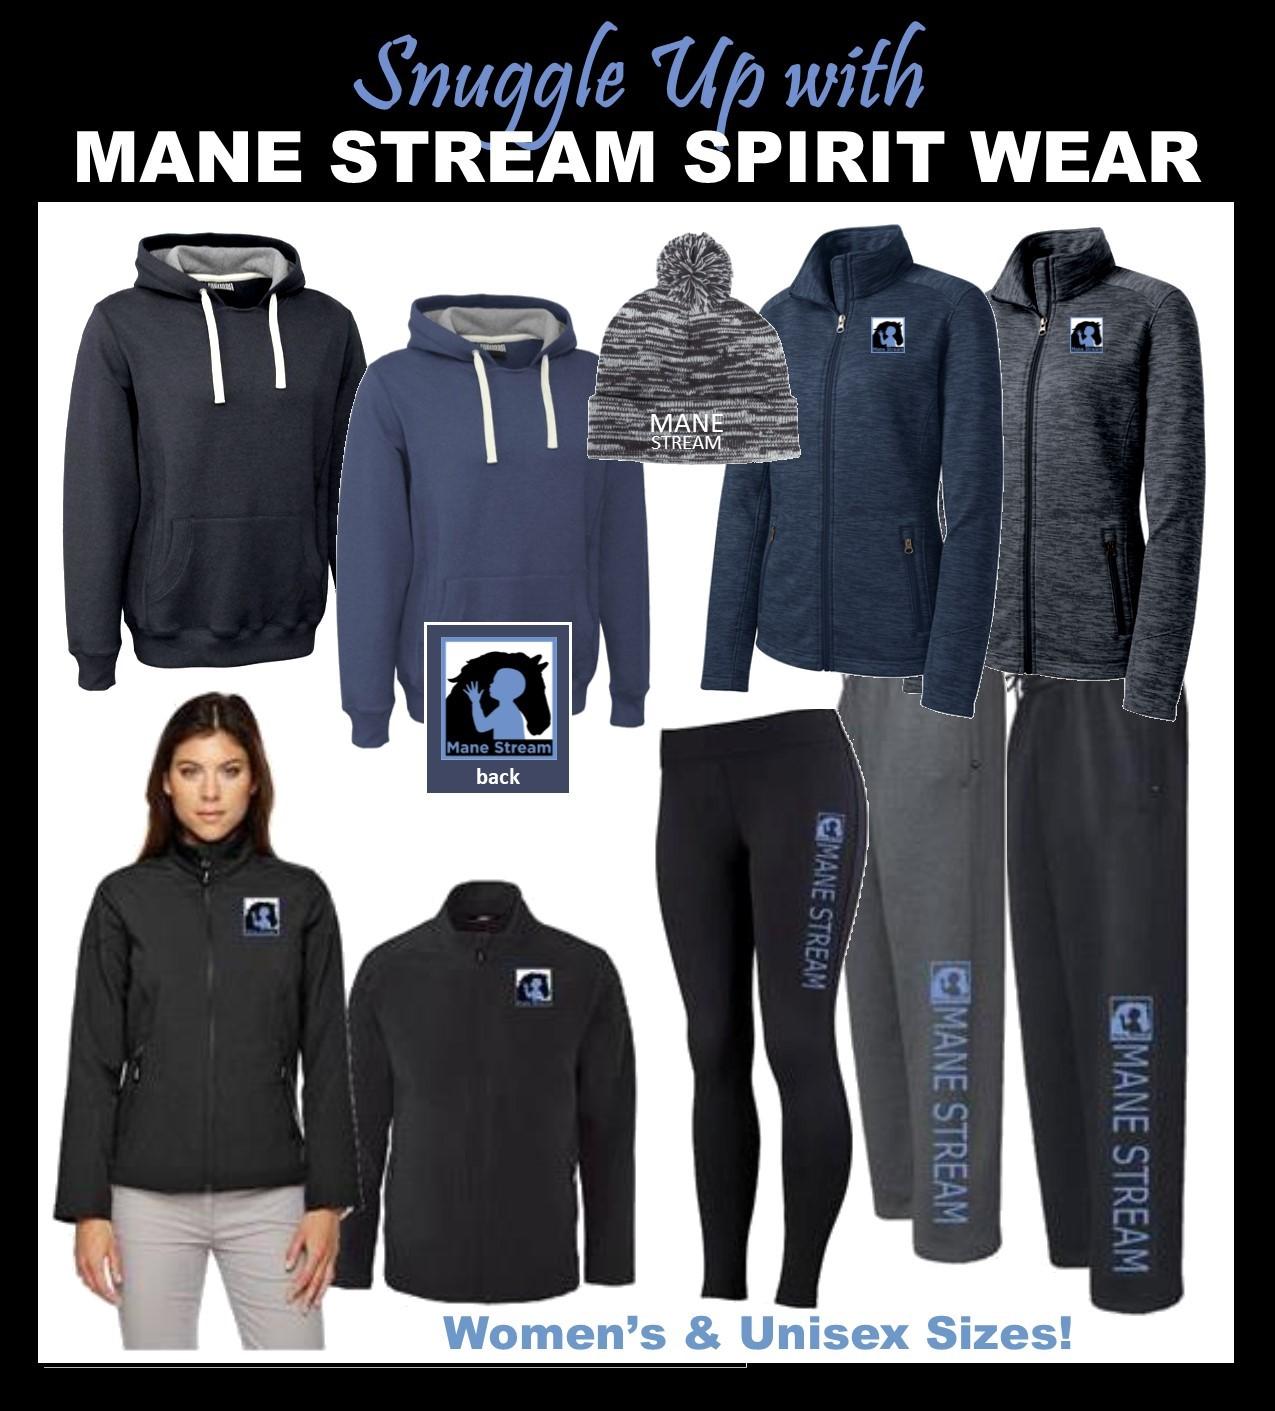 snuggle up spirit wear.jpg